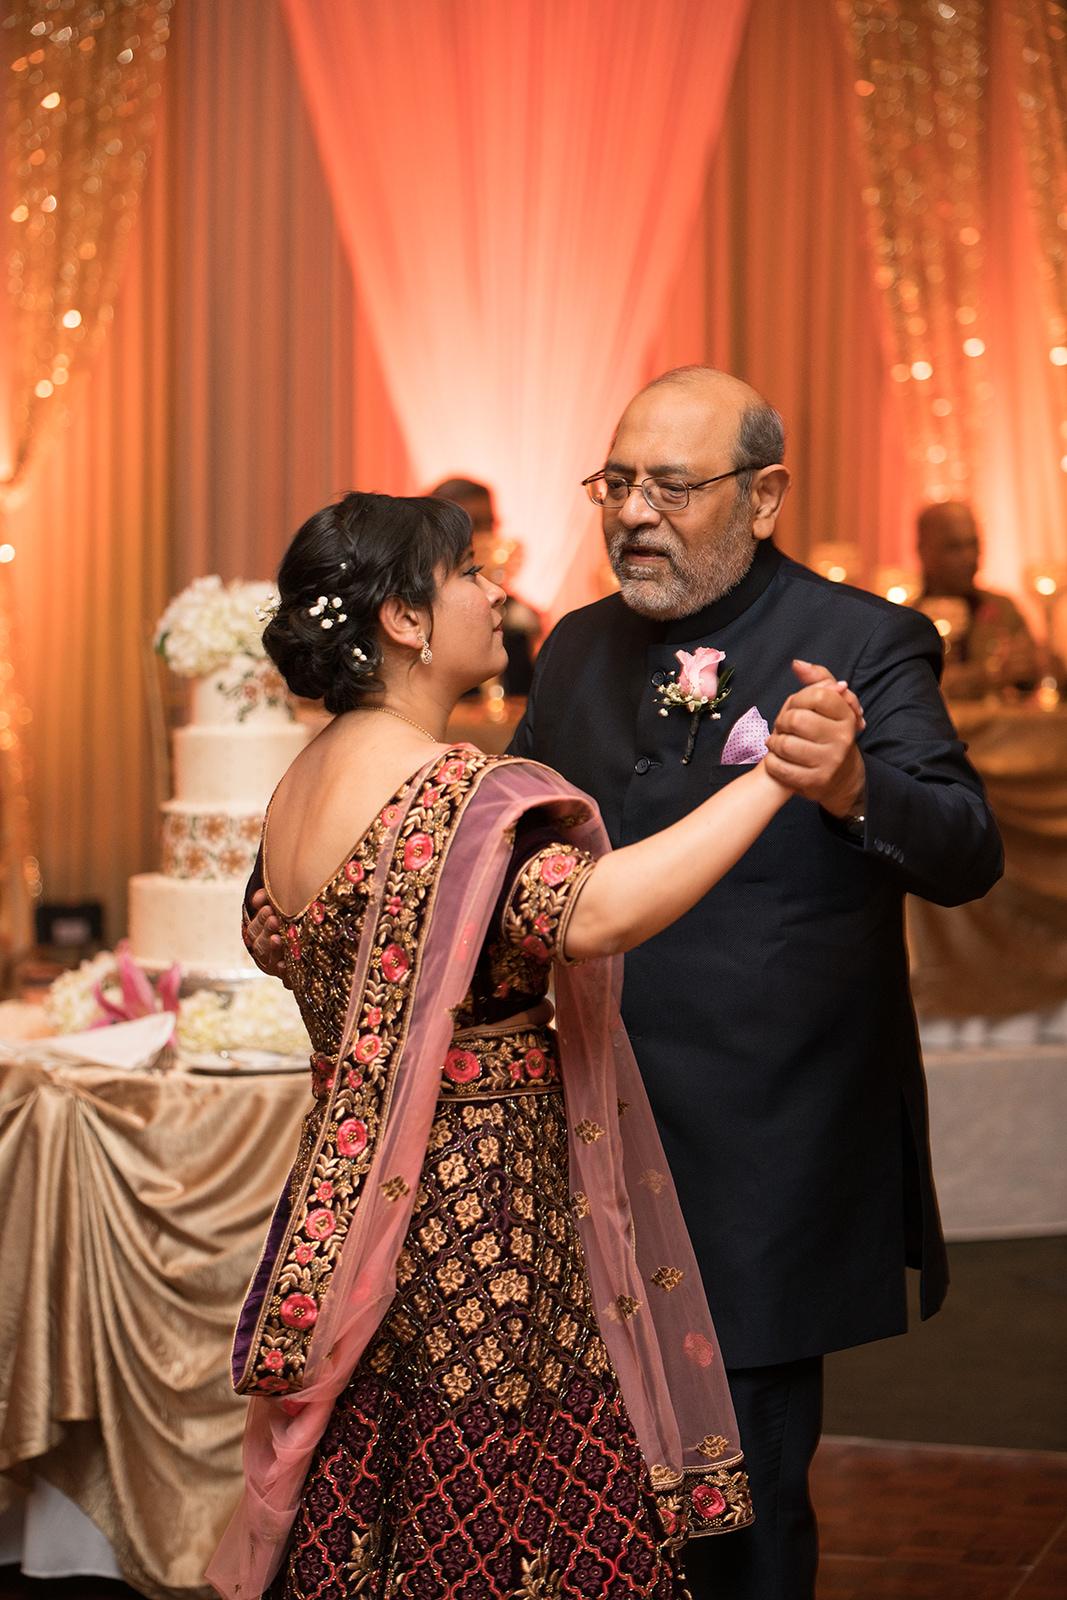 Le Cape Weddings - South Asian Wedding - Ishani and Sidhart - Wedding Reception - Dance-7.jpg